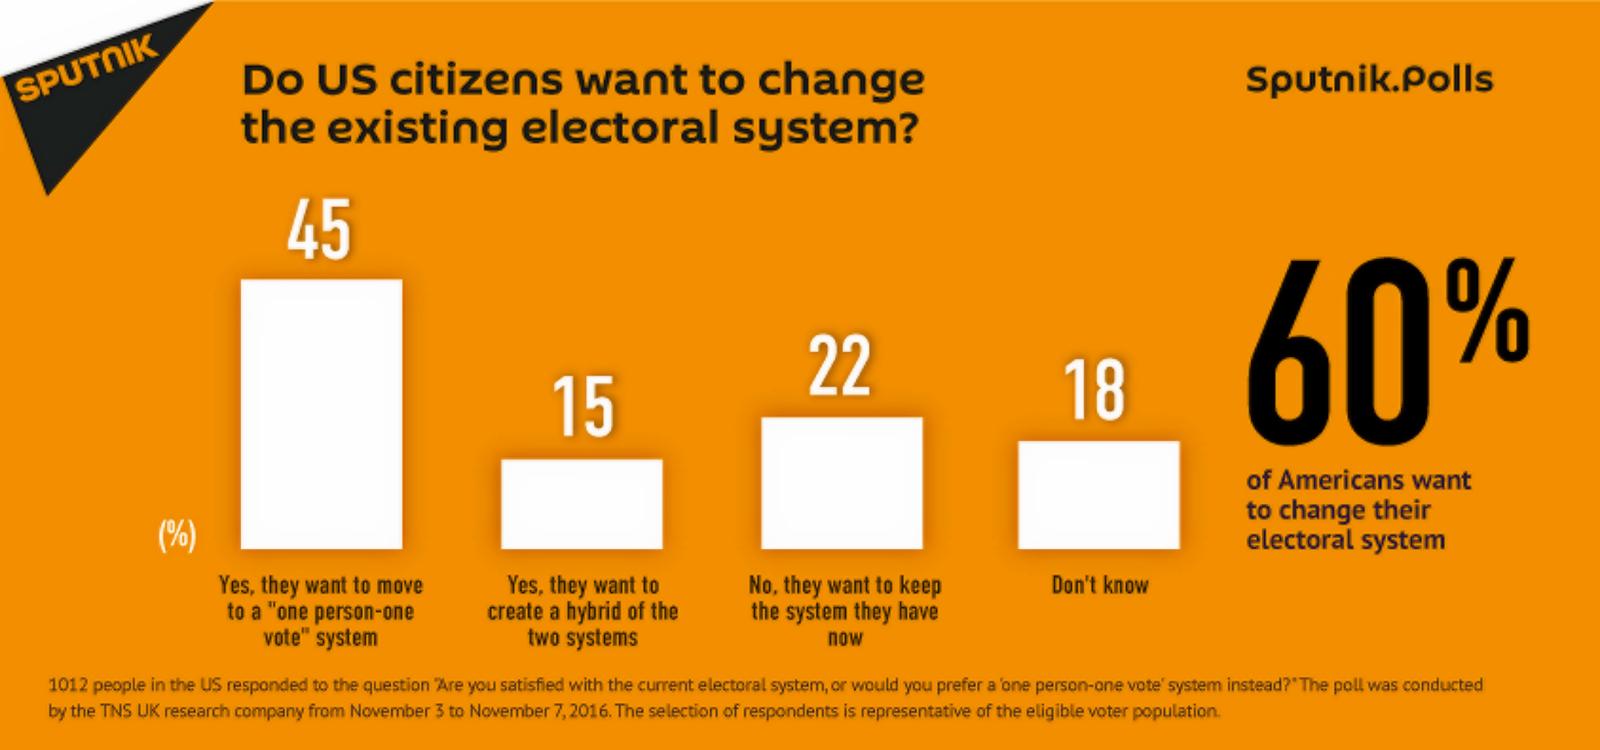 00-sputnik-polls-electoral-system-usa-111116